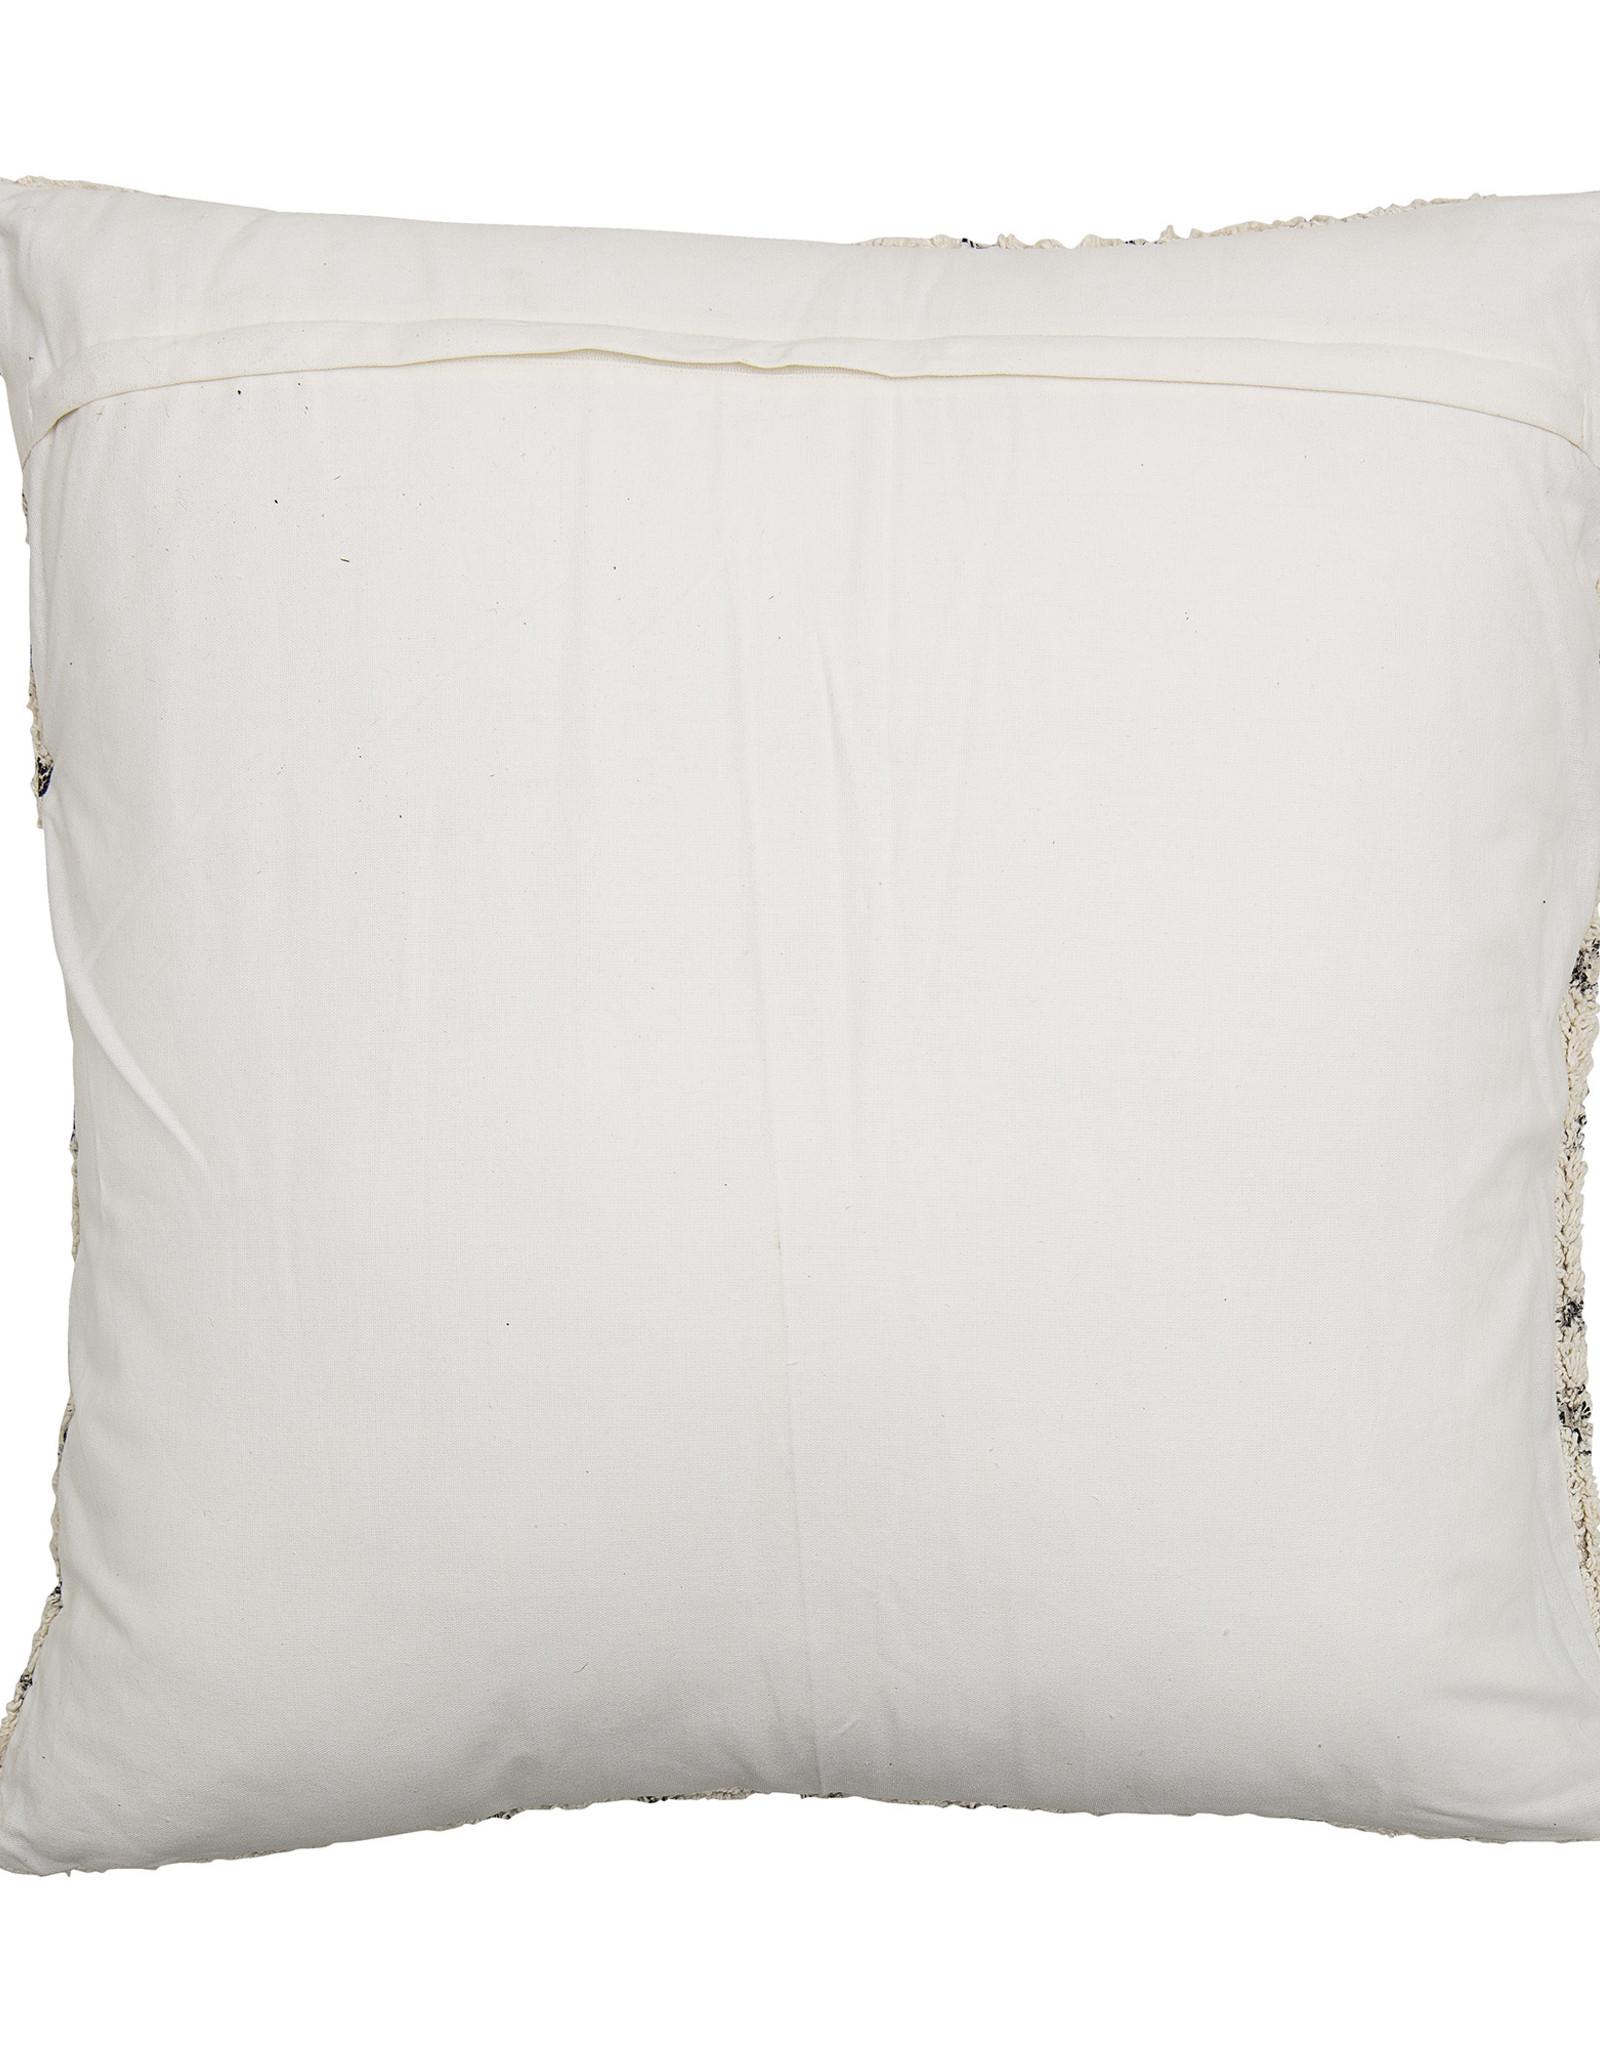 Creative Colection Nea Cushion, Grey, Cotton